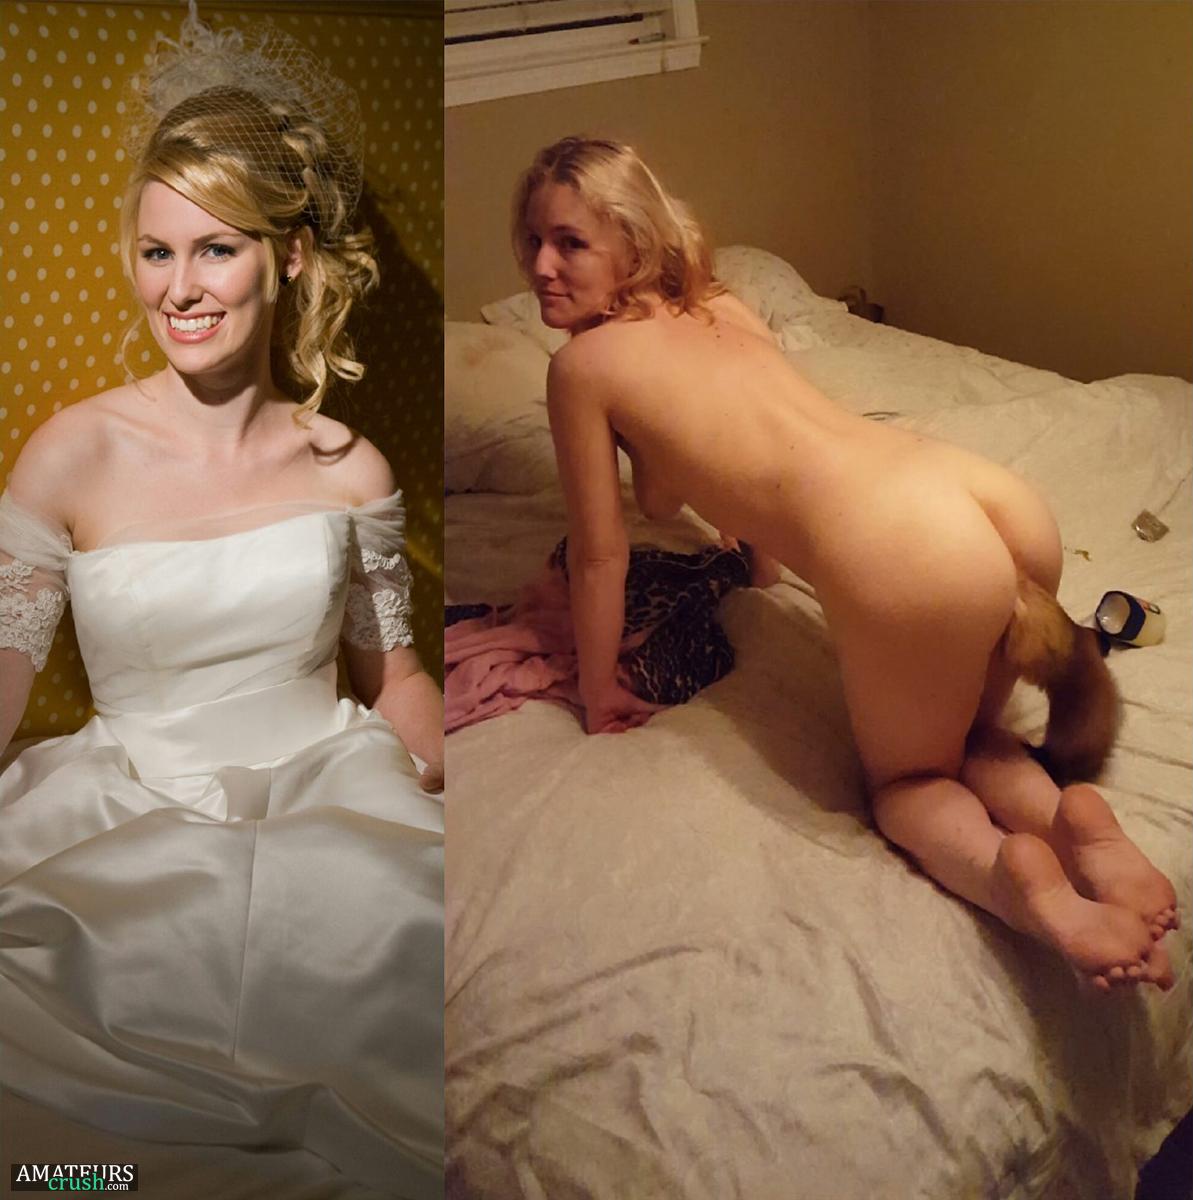 Bride getting undressed